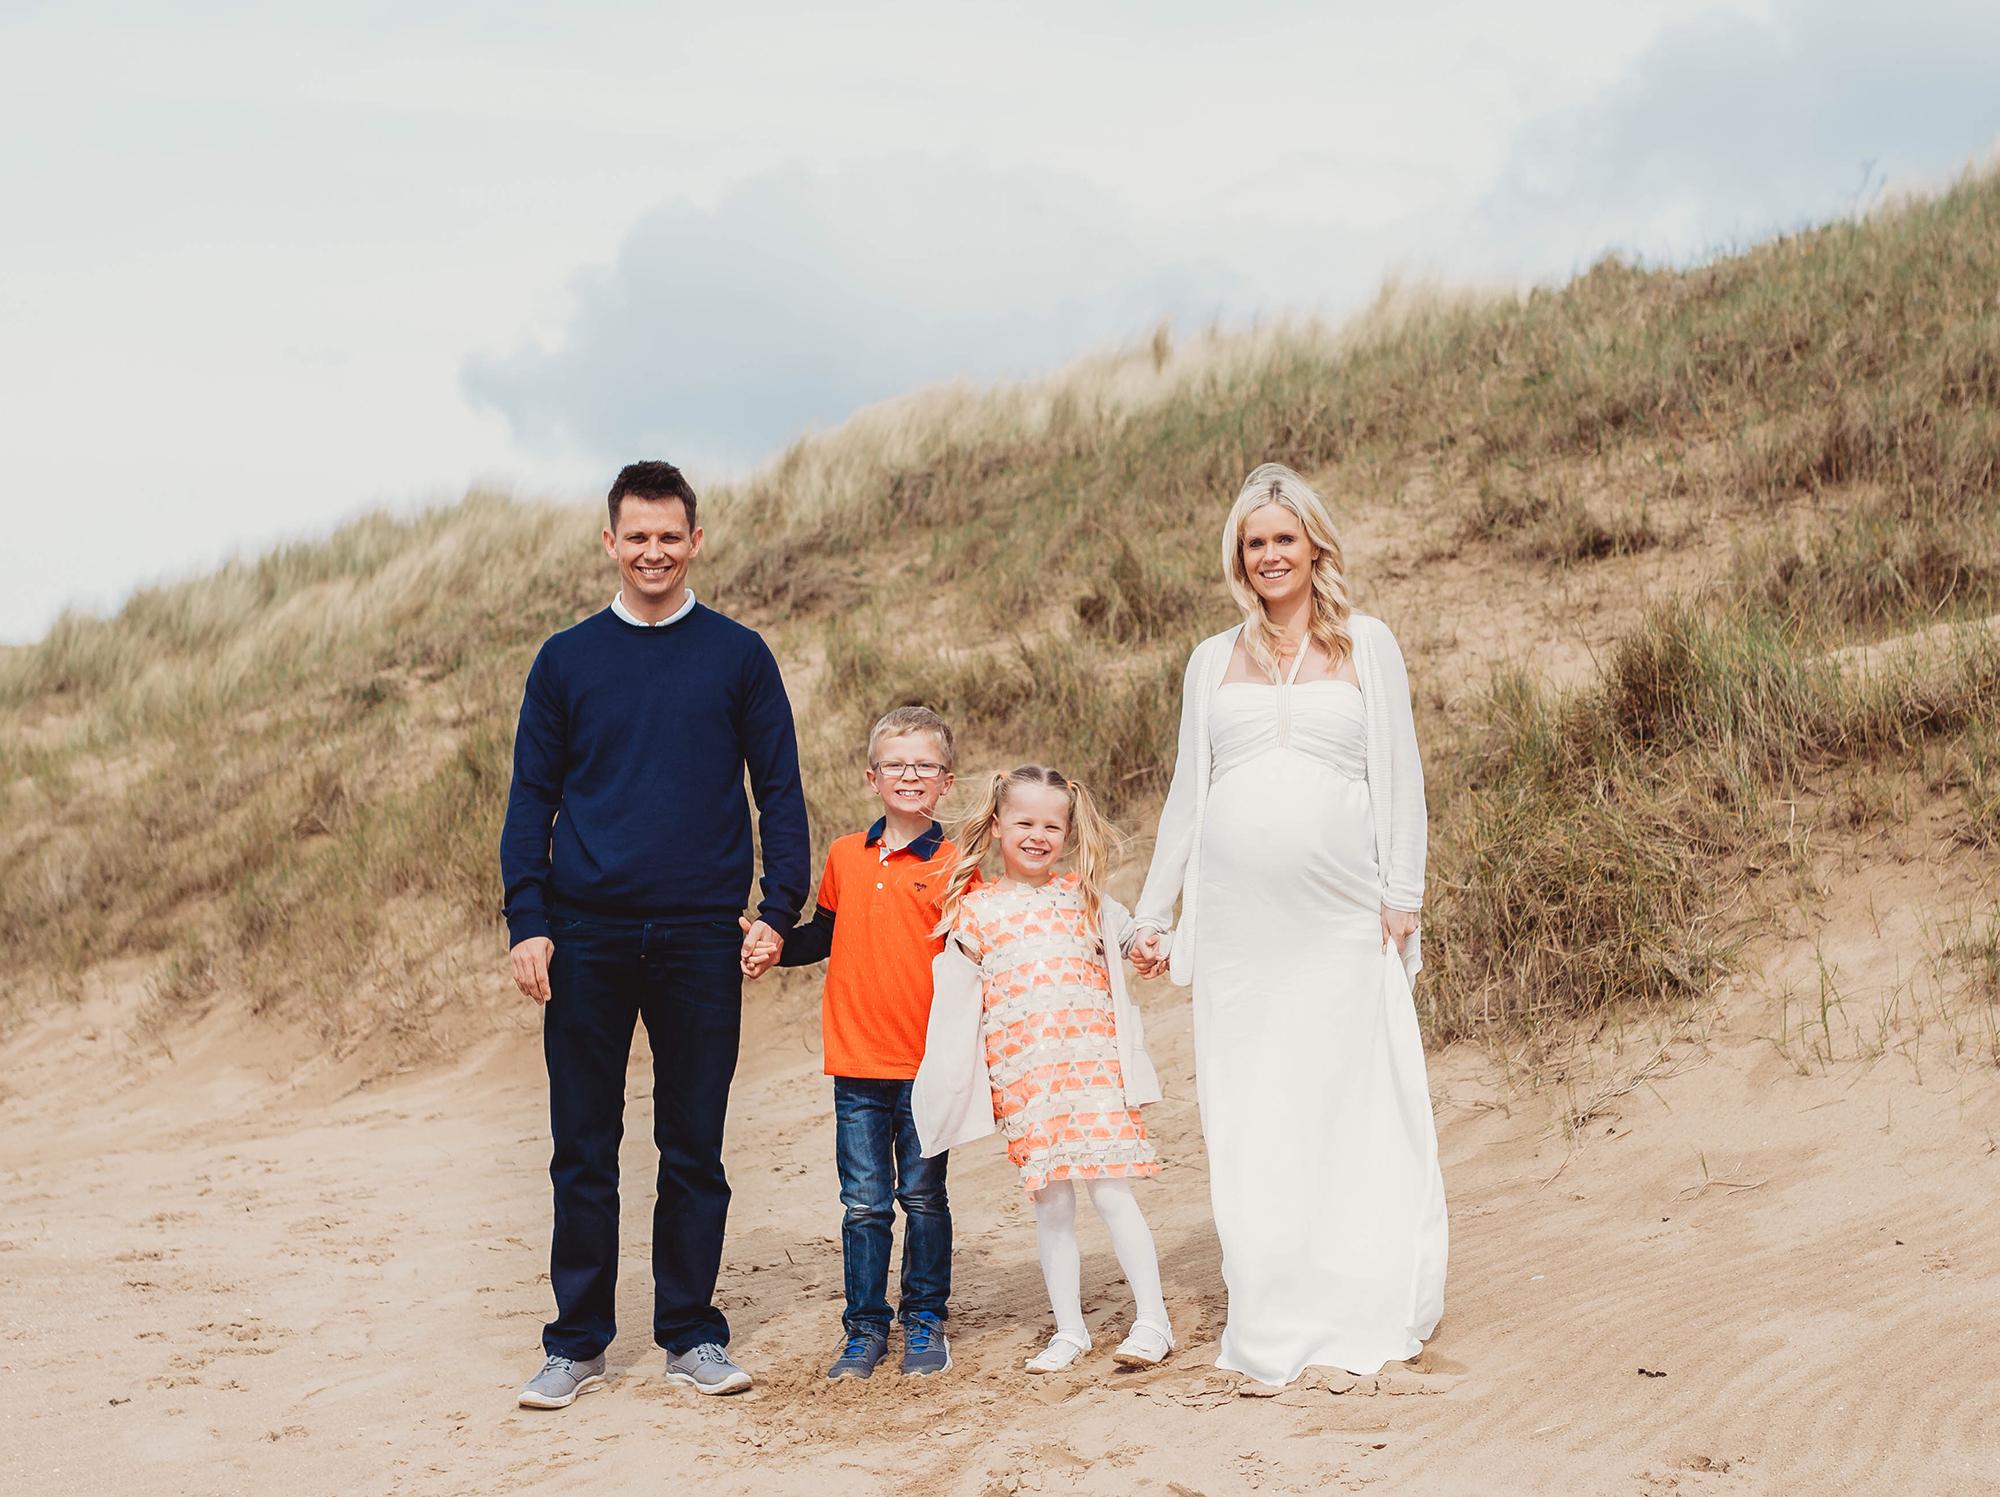 family photoshoot on the beach family photos me & mine april